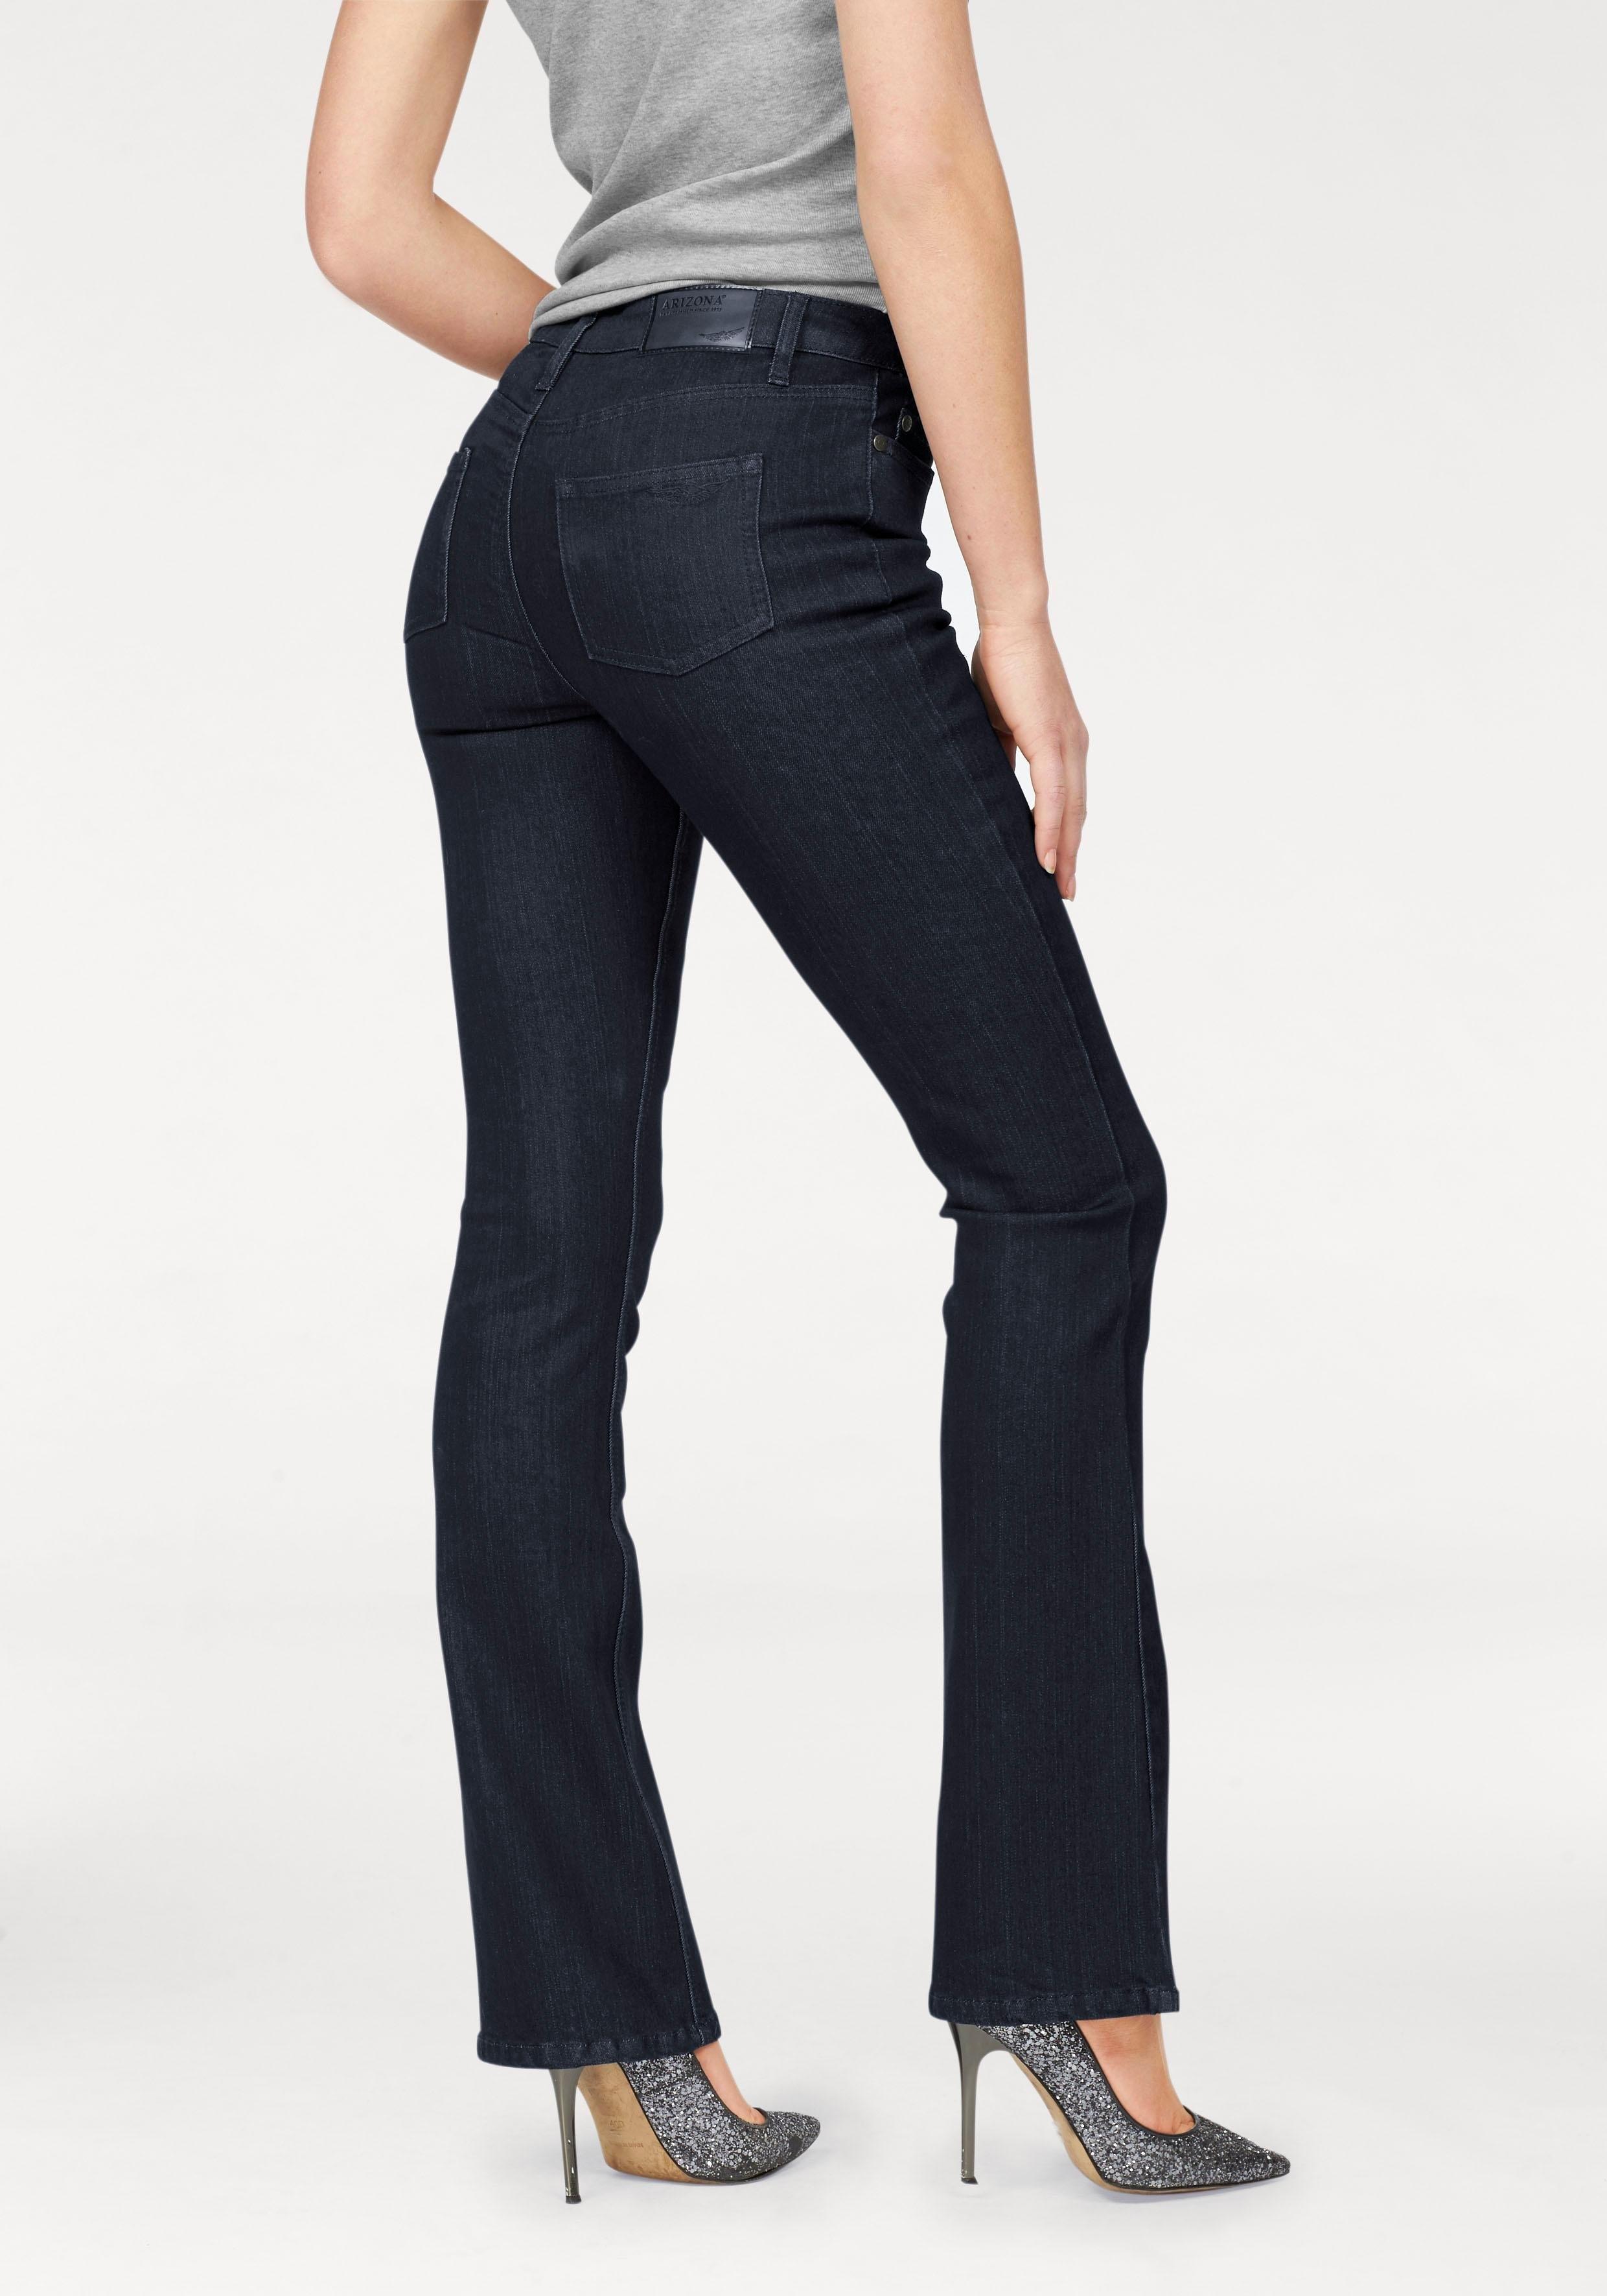 Arizona bootcut jeans Baby Bootcut High Waist nu online kopen bij OTTO